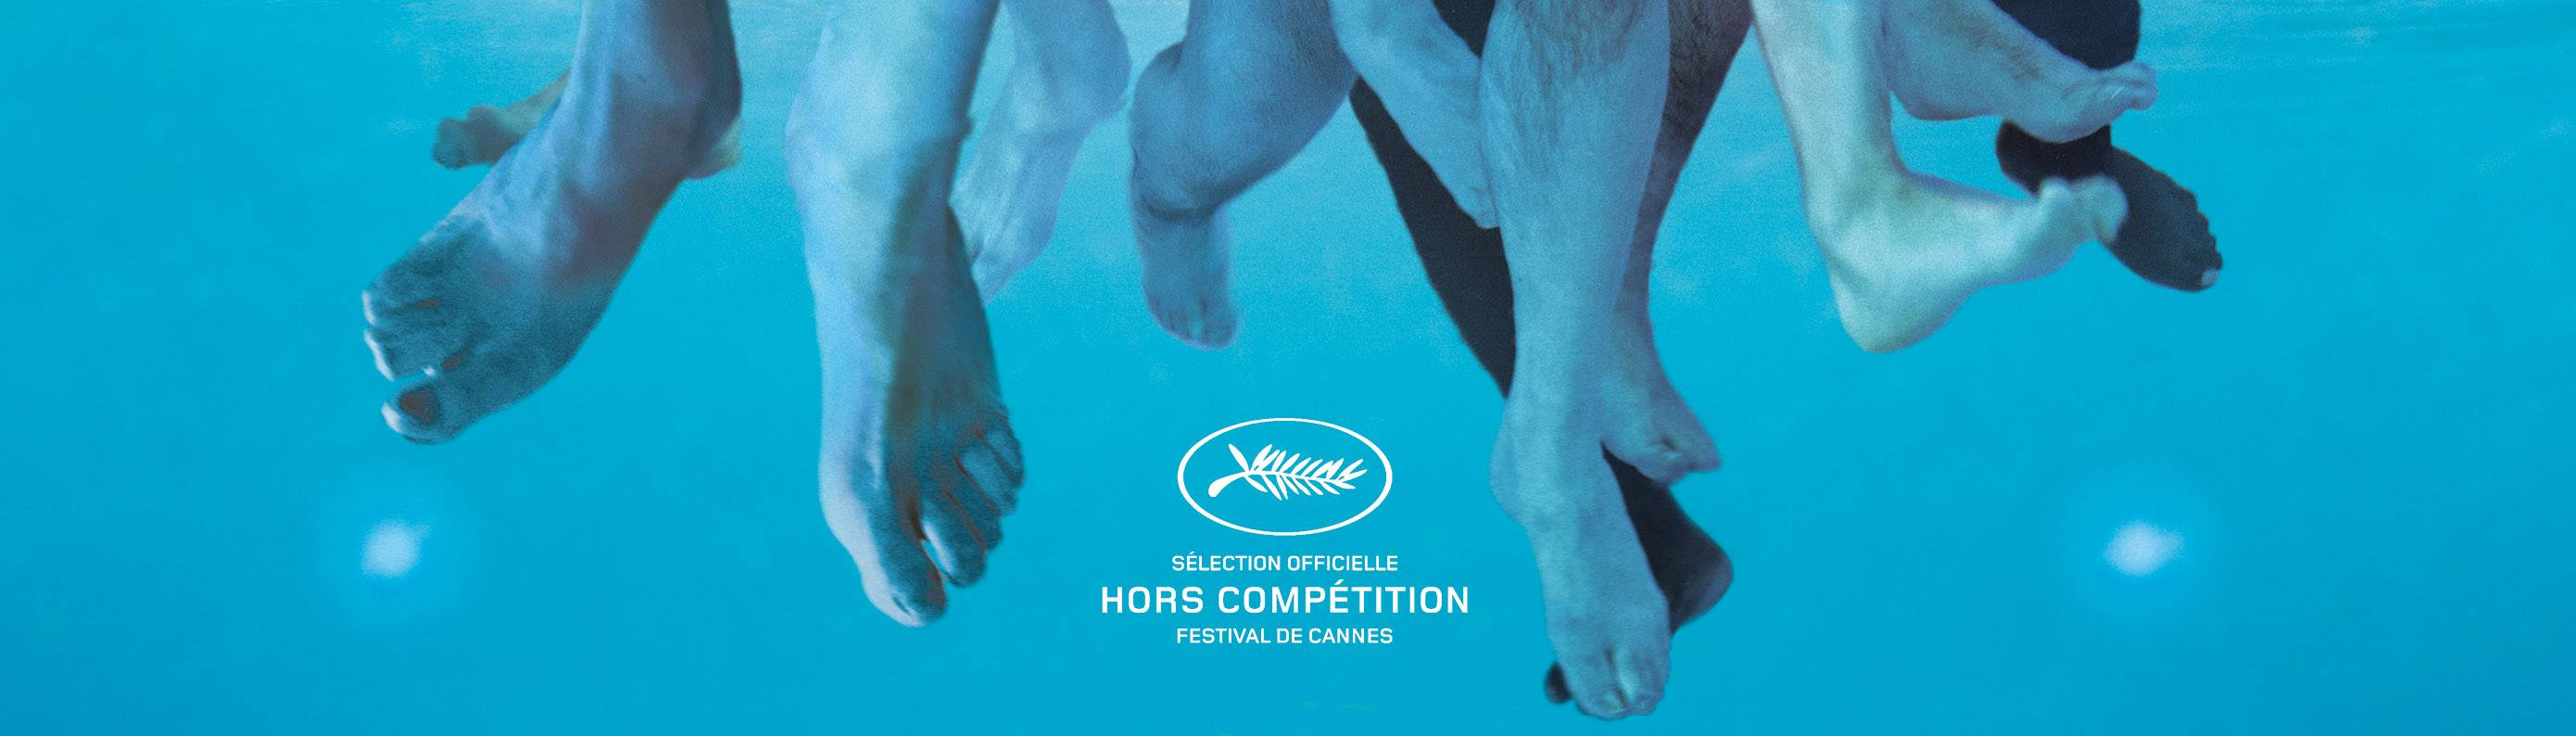 Le grand bain gilles lellouche selection festival cannes